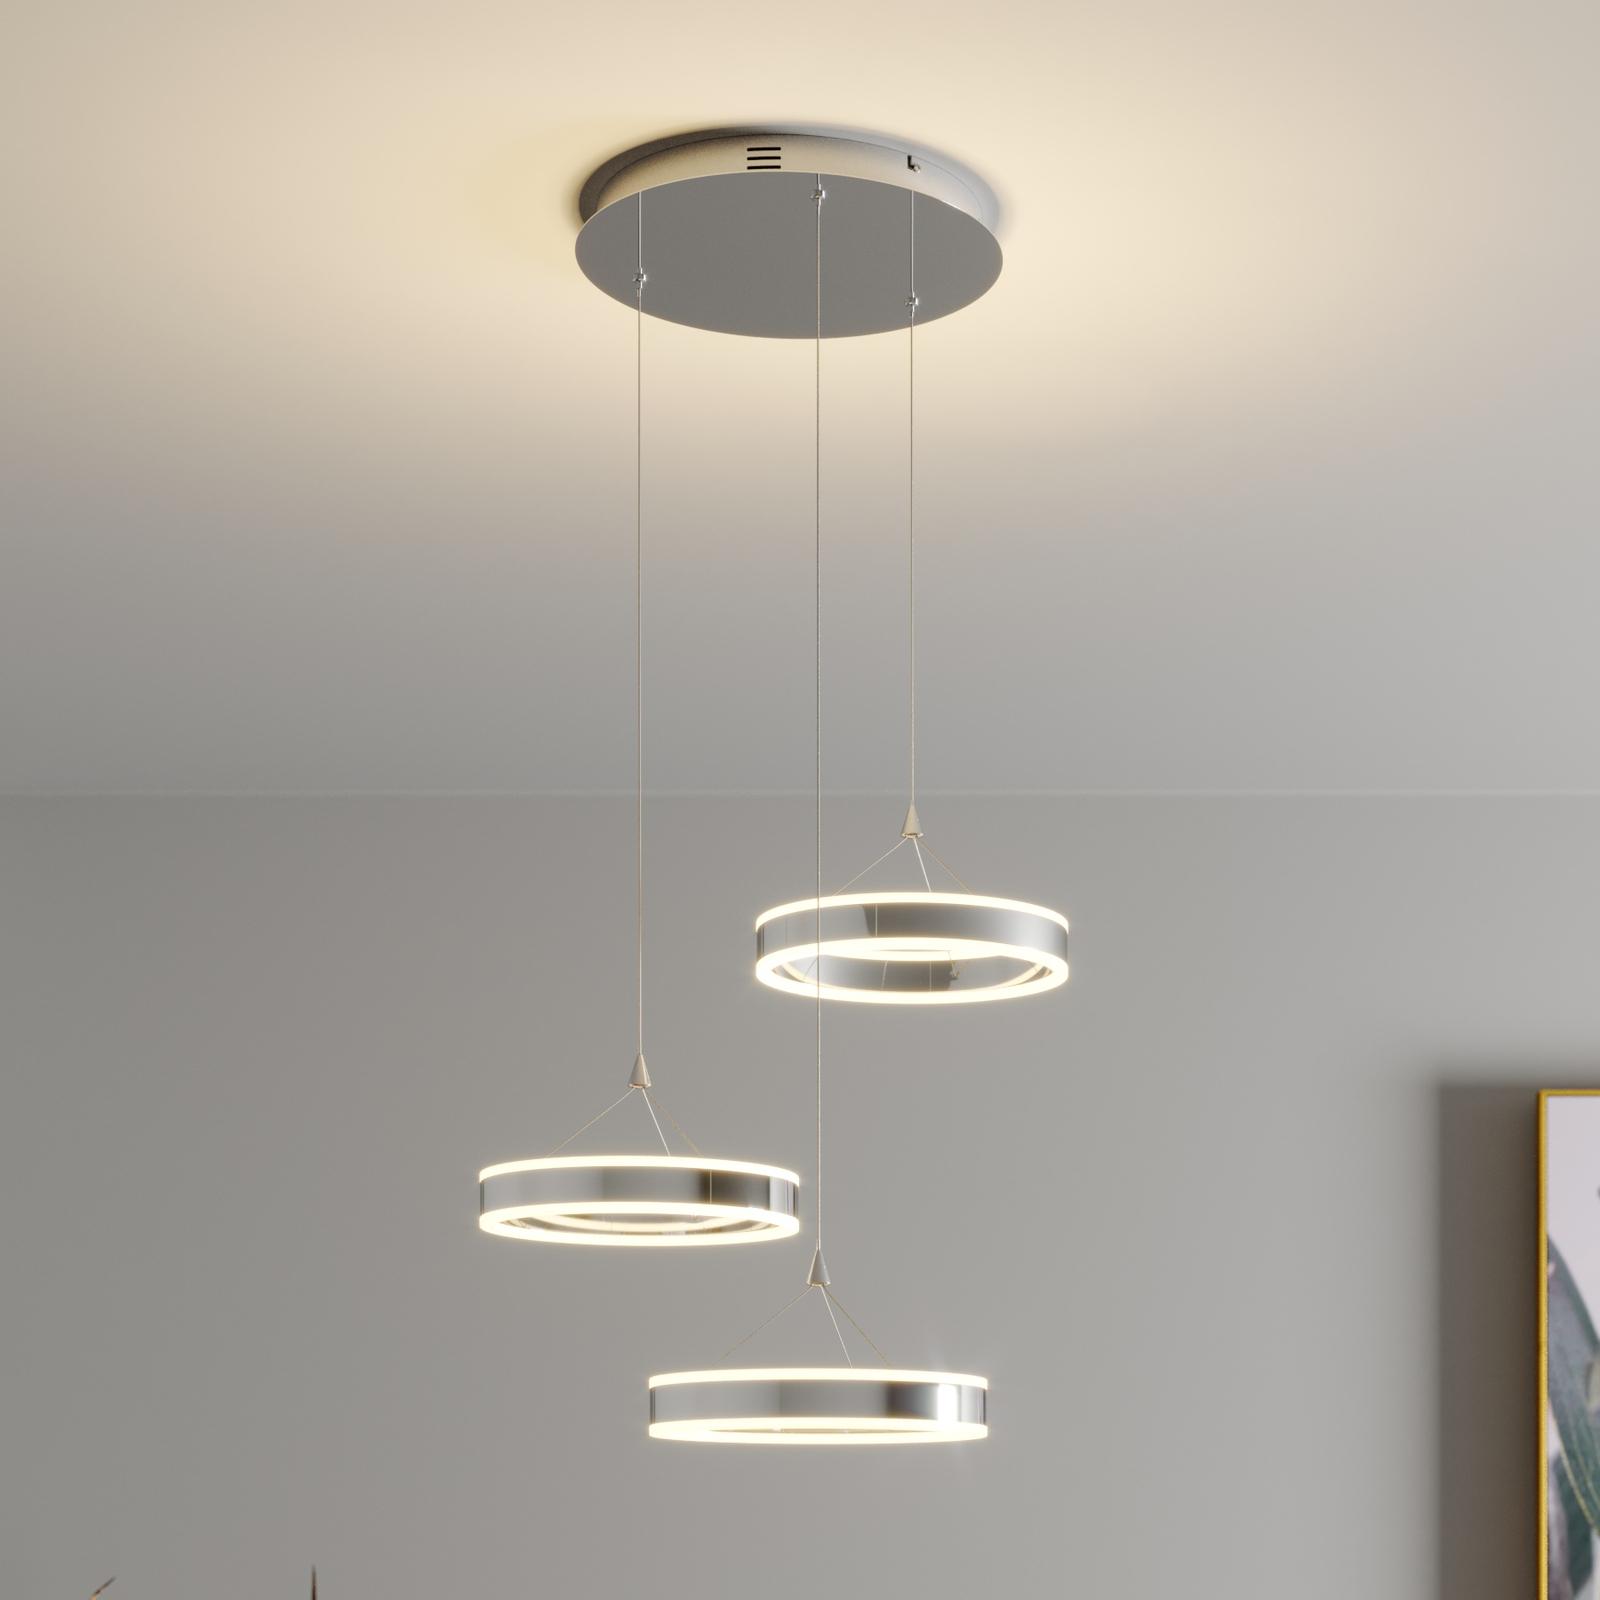 LED-Pendellampe Lyani, 3 Ringe, Höhe verschieden